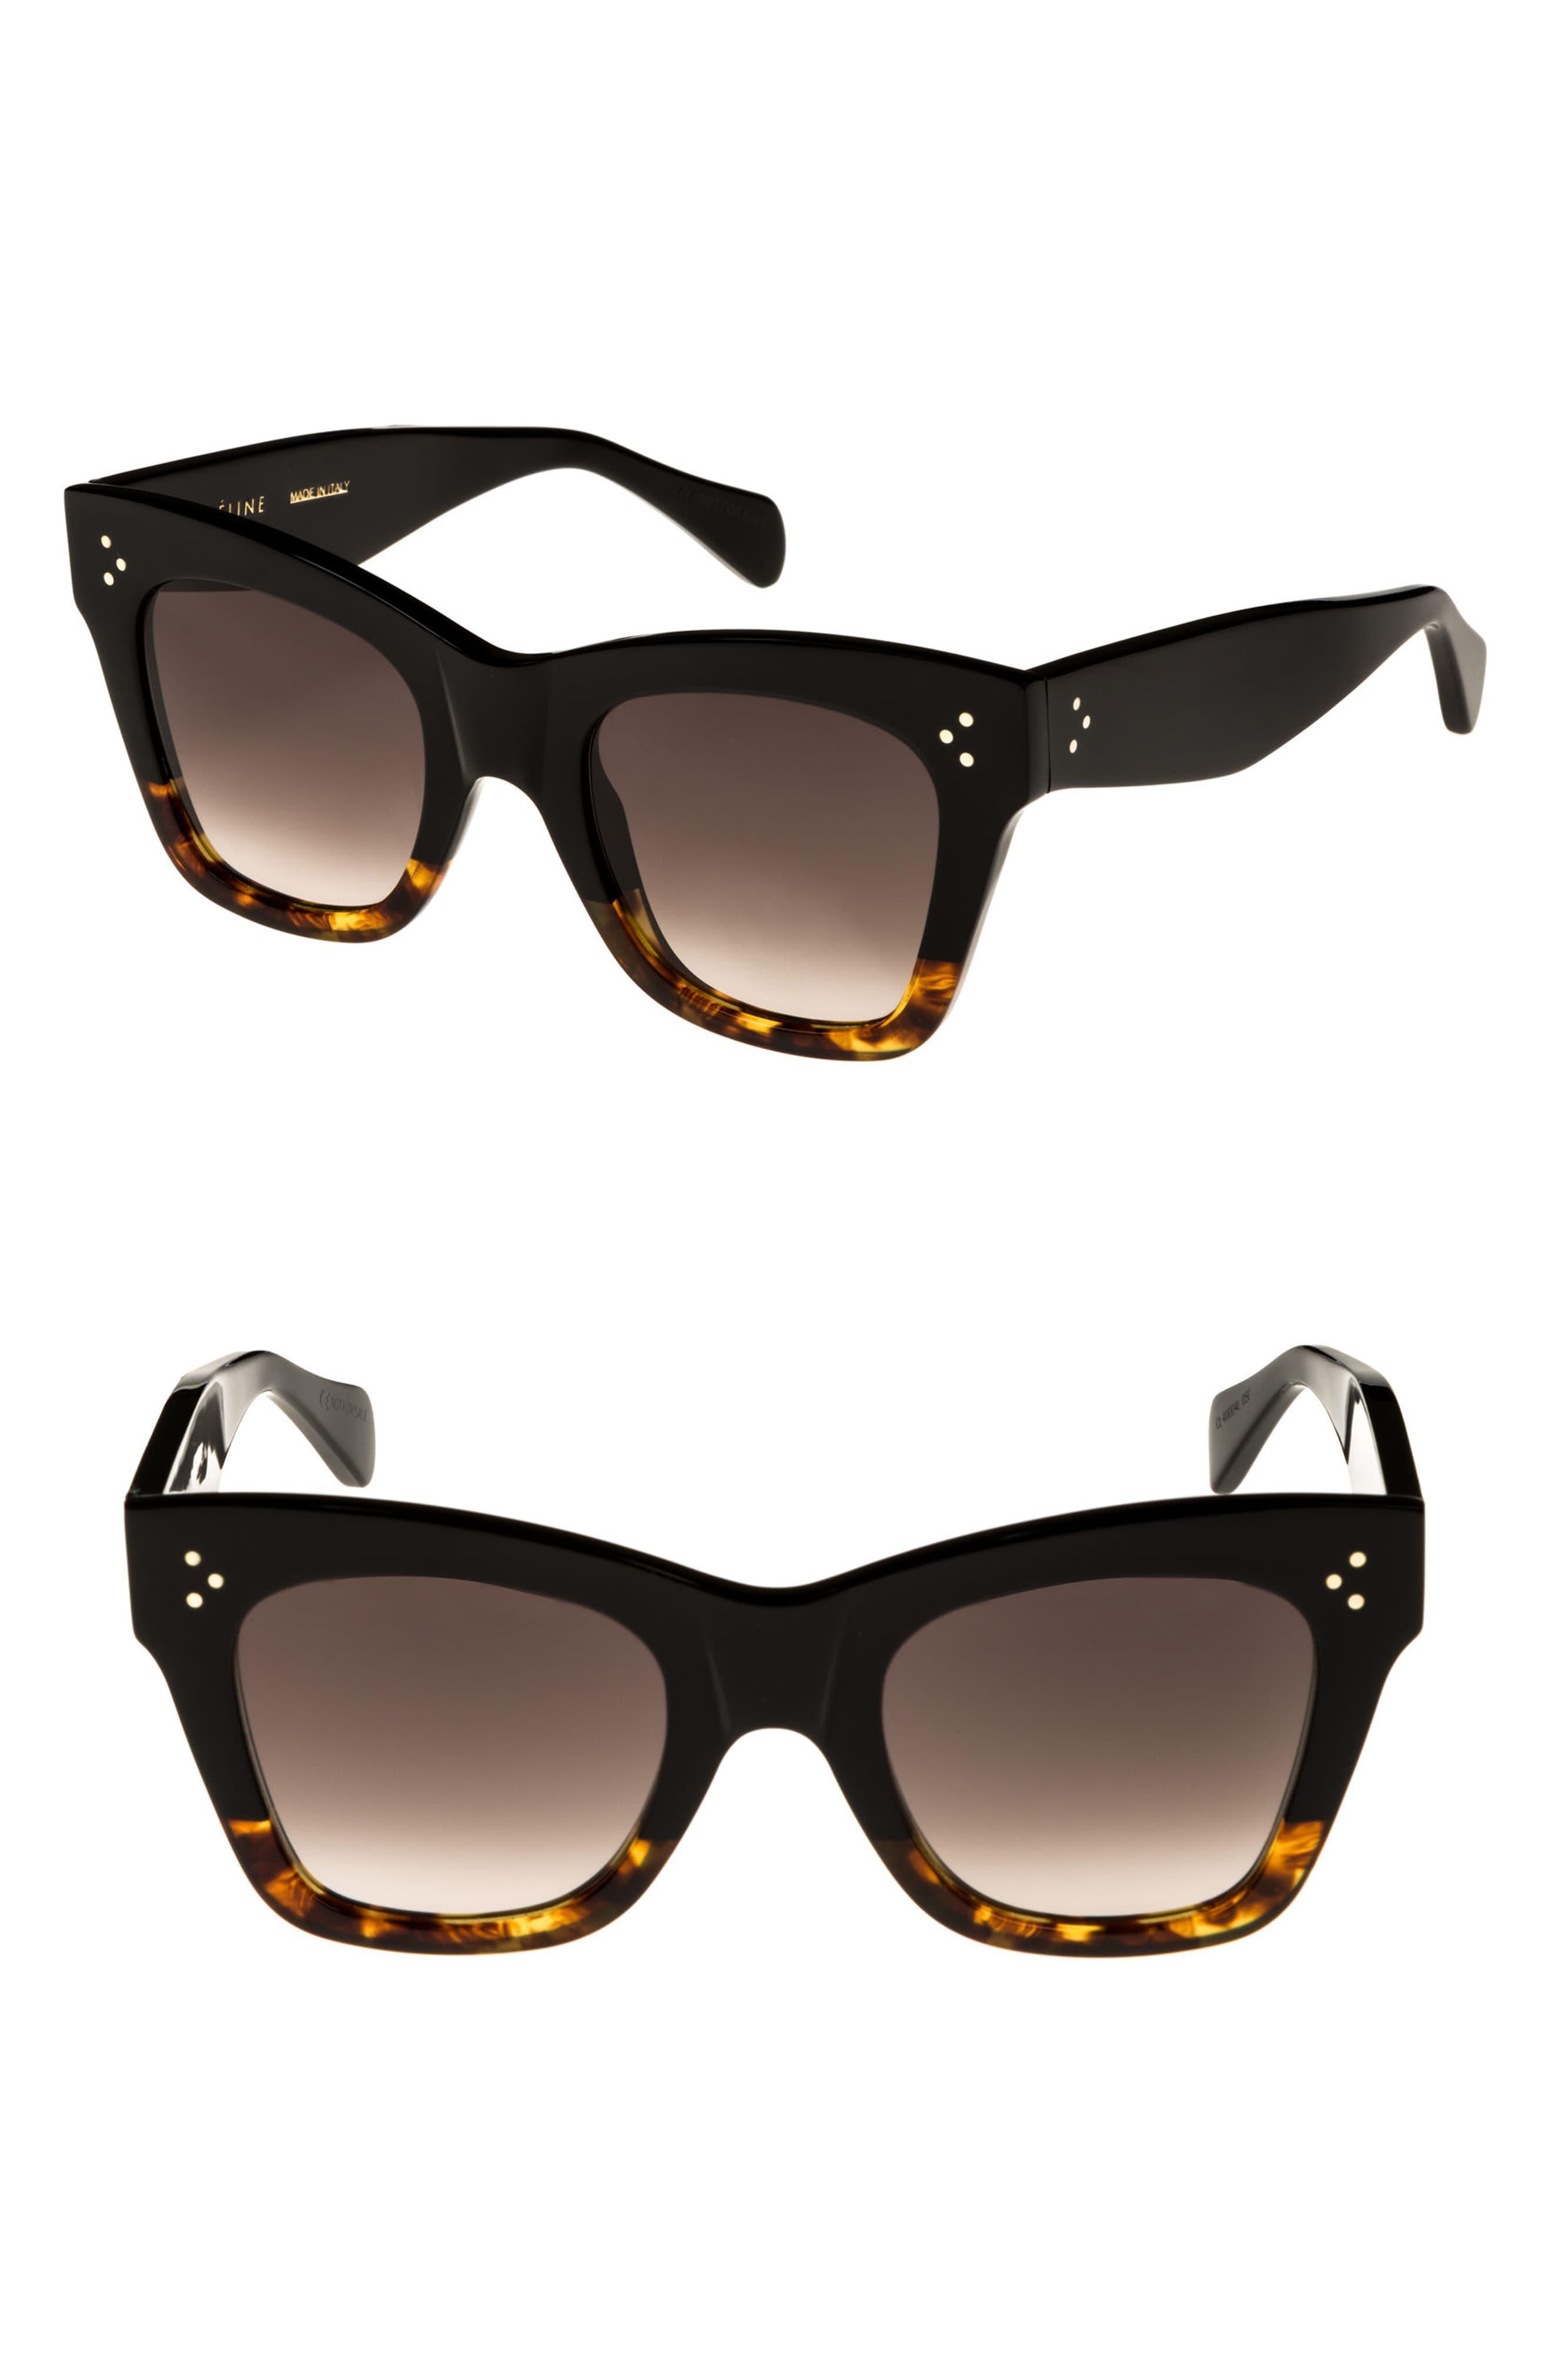 3552c3047b090 Céline 50mm Gradient Butterfly Sunglasses in Black - Lyst